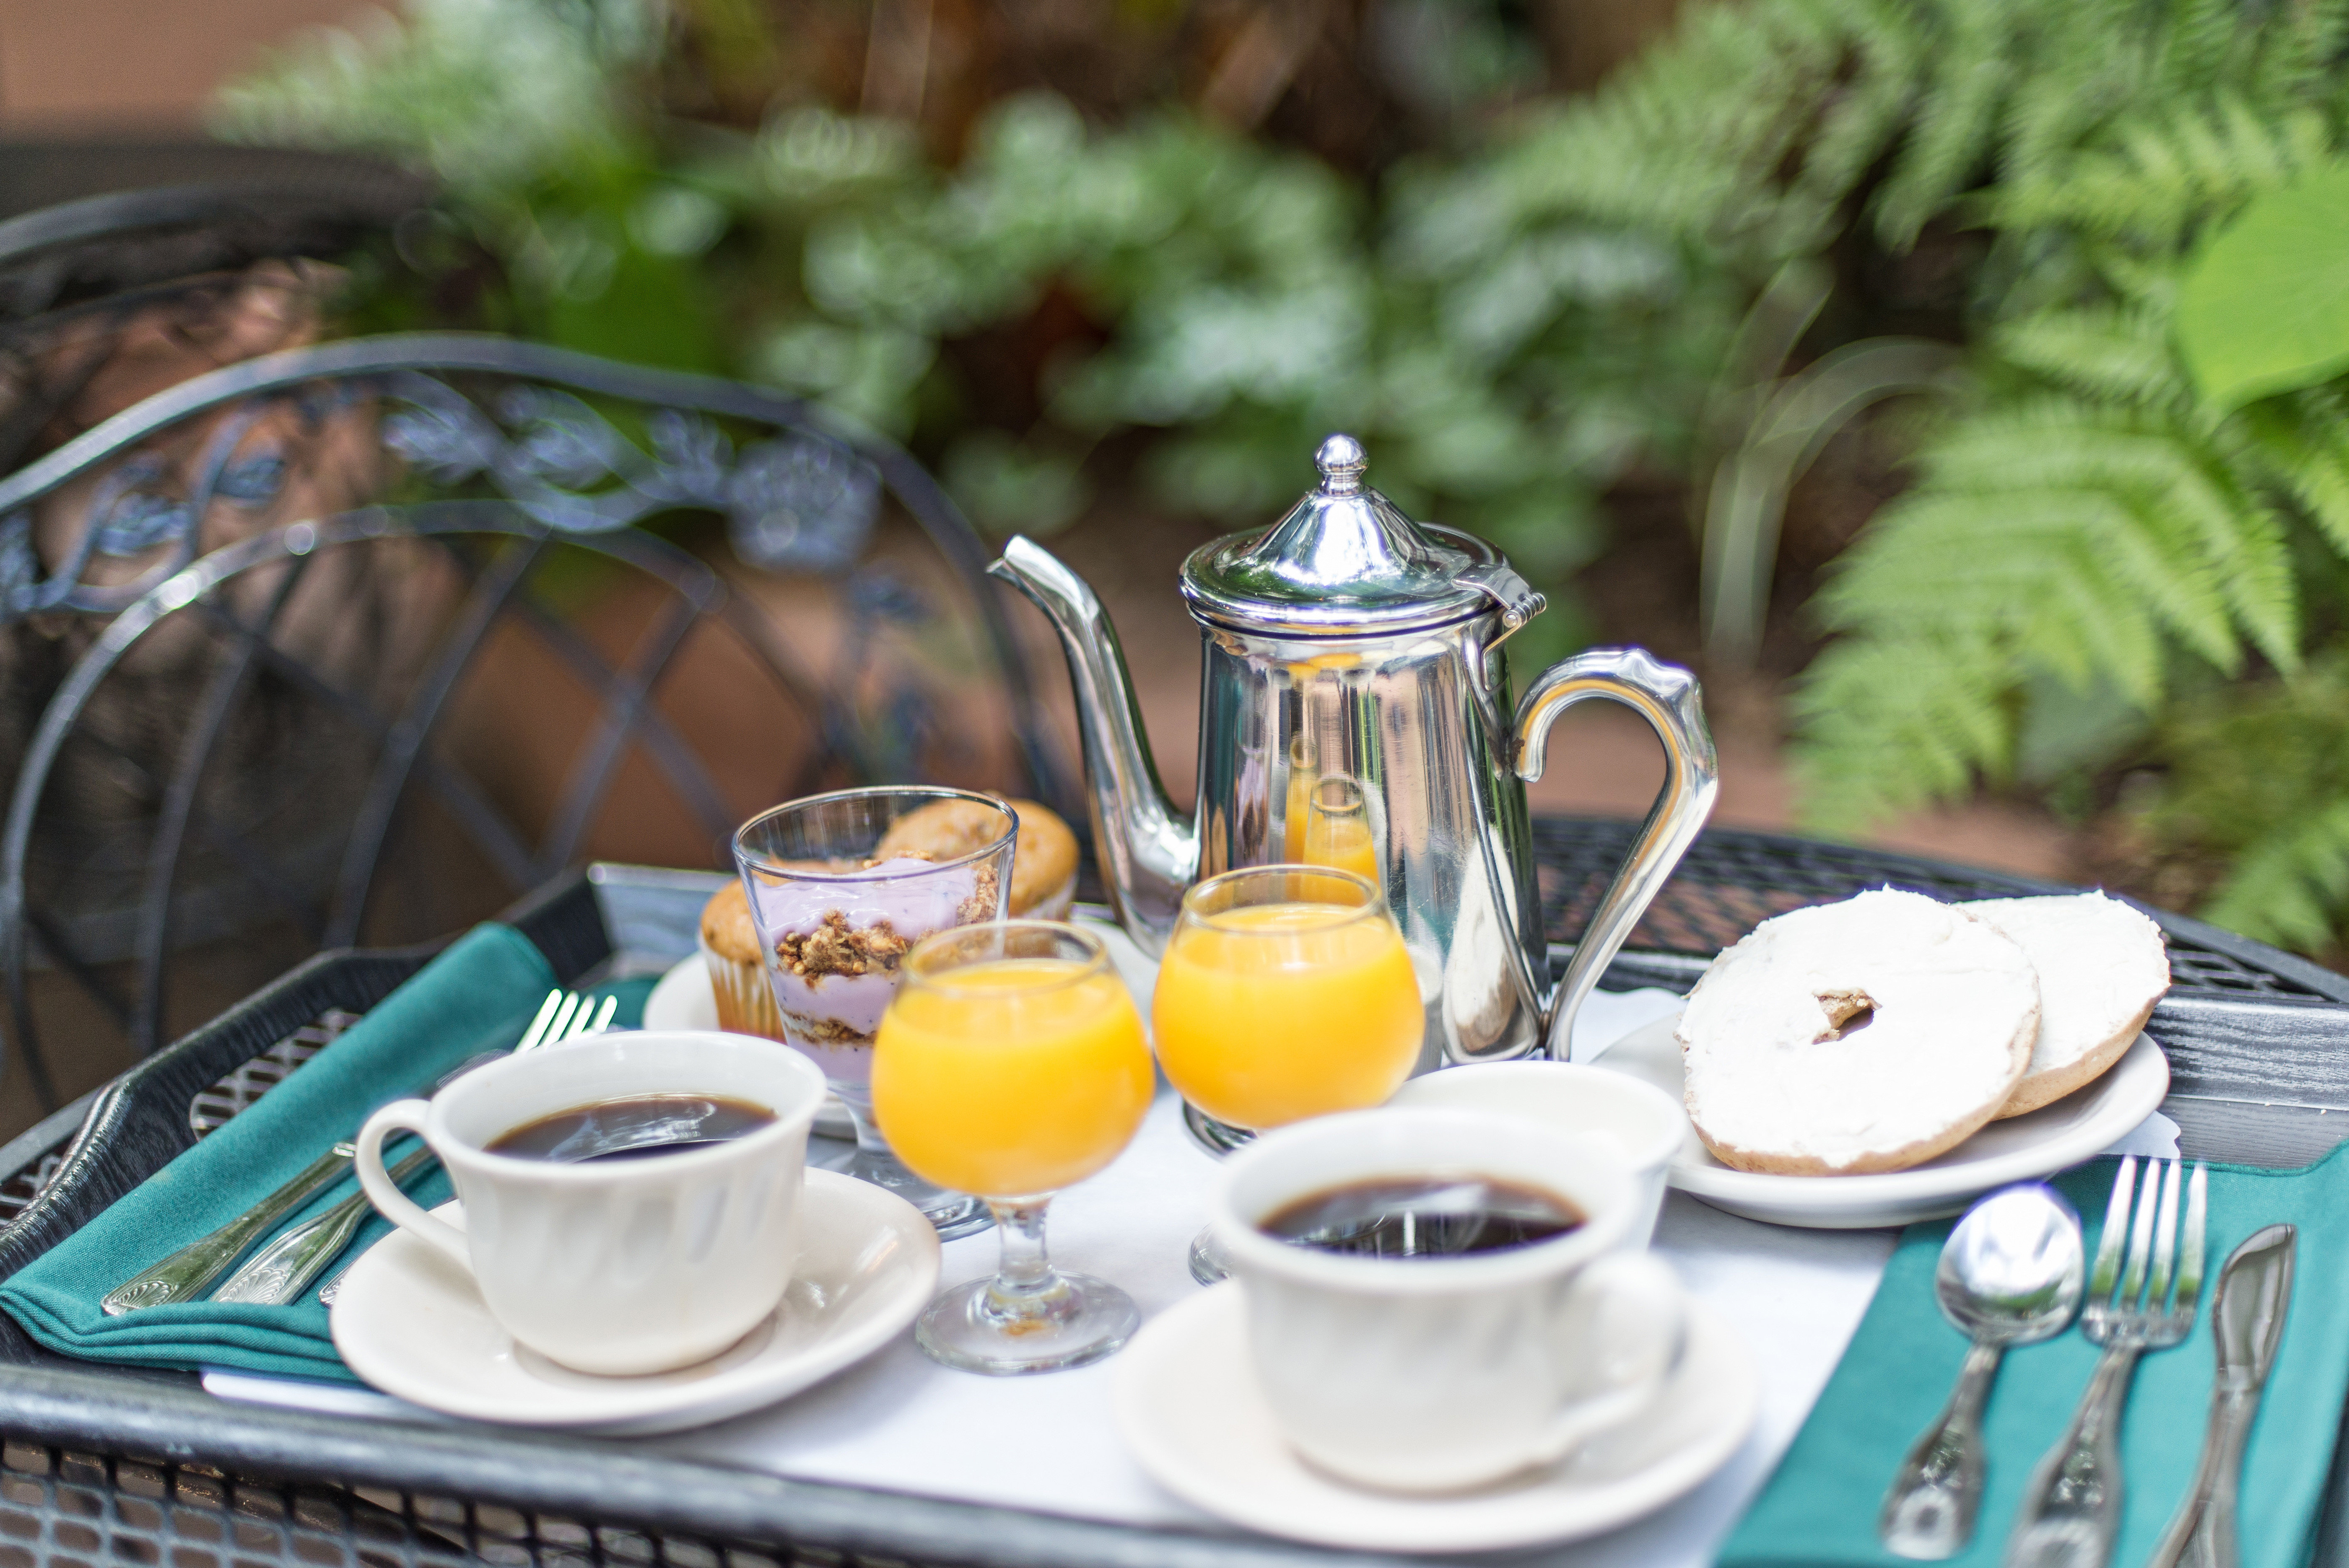 coffee cup breakfast Drink brunch tea set dining table